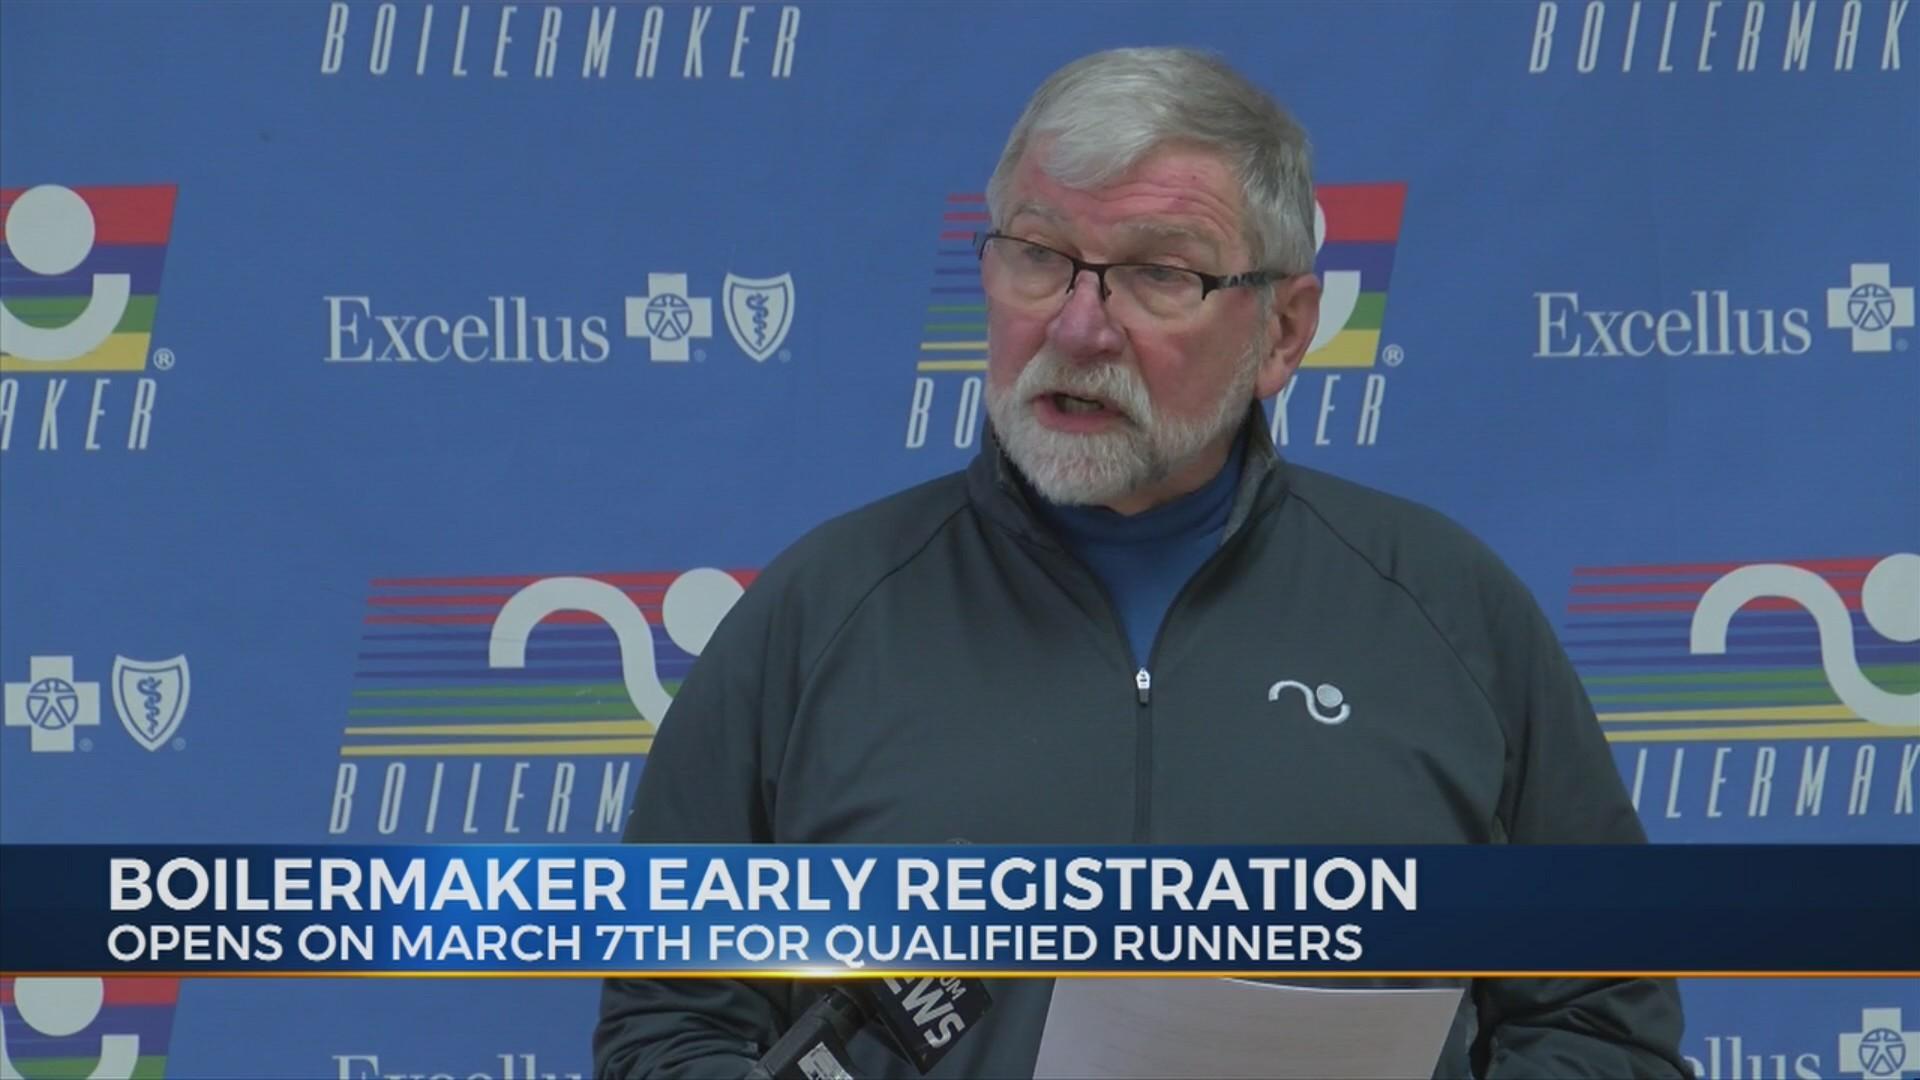 Boilermaker Announces Early Registration